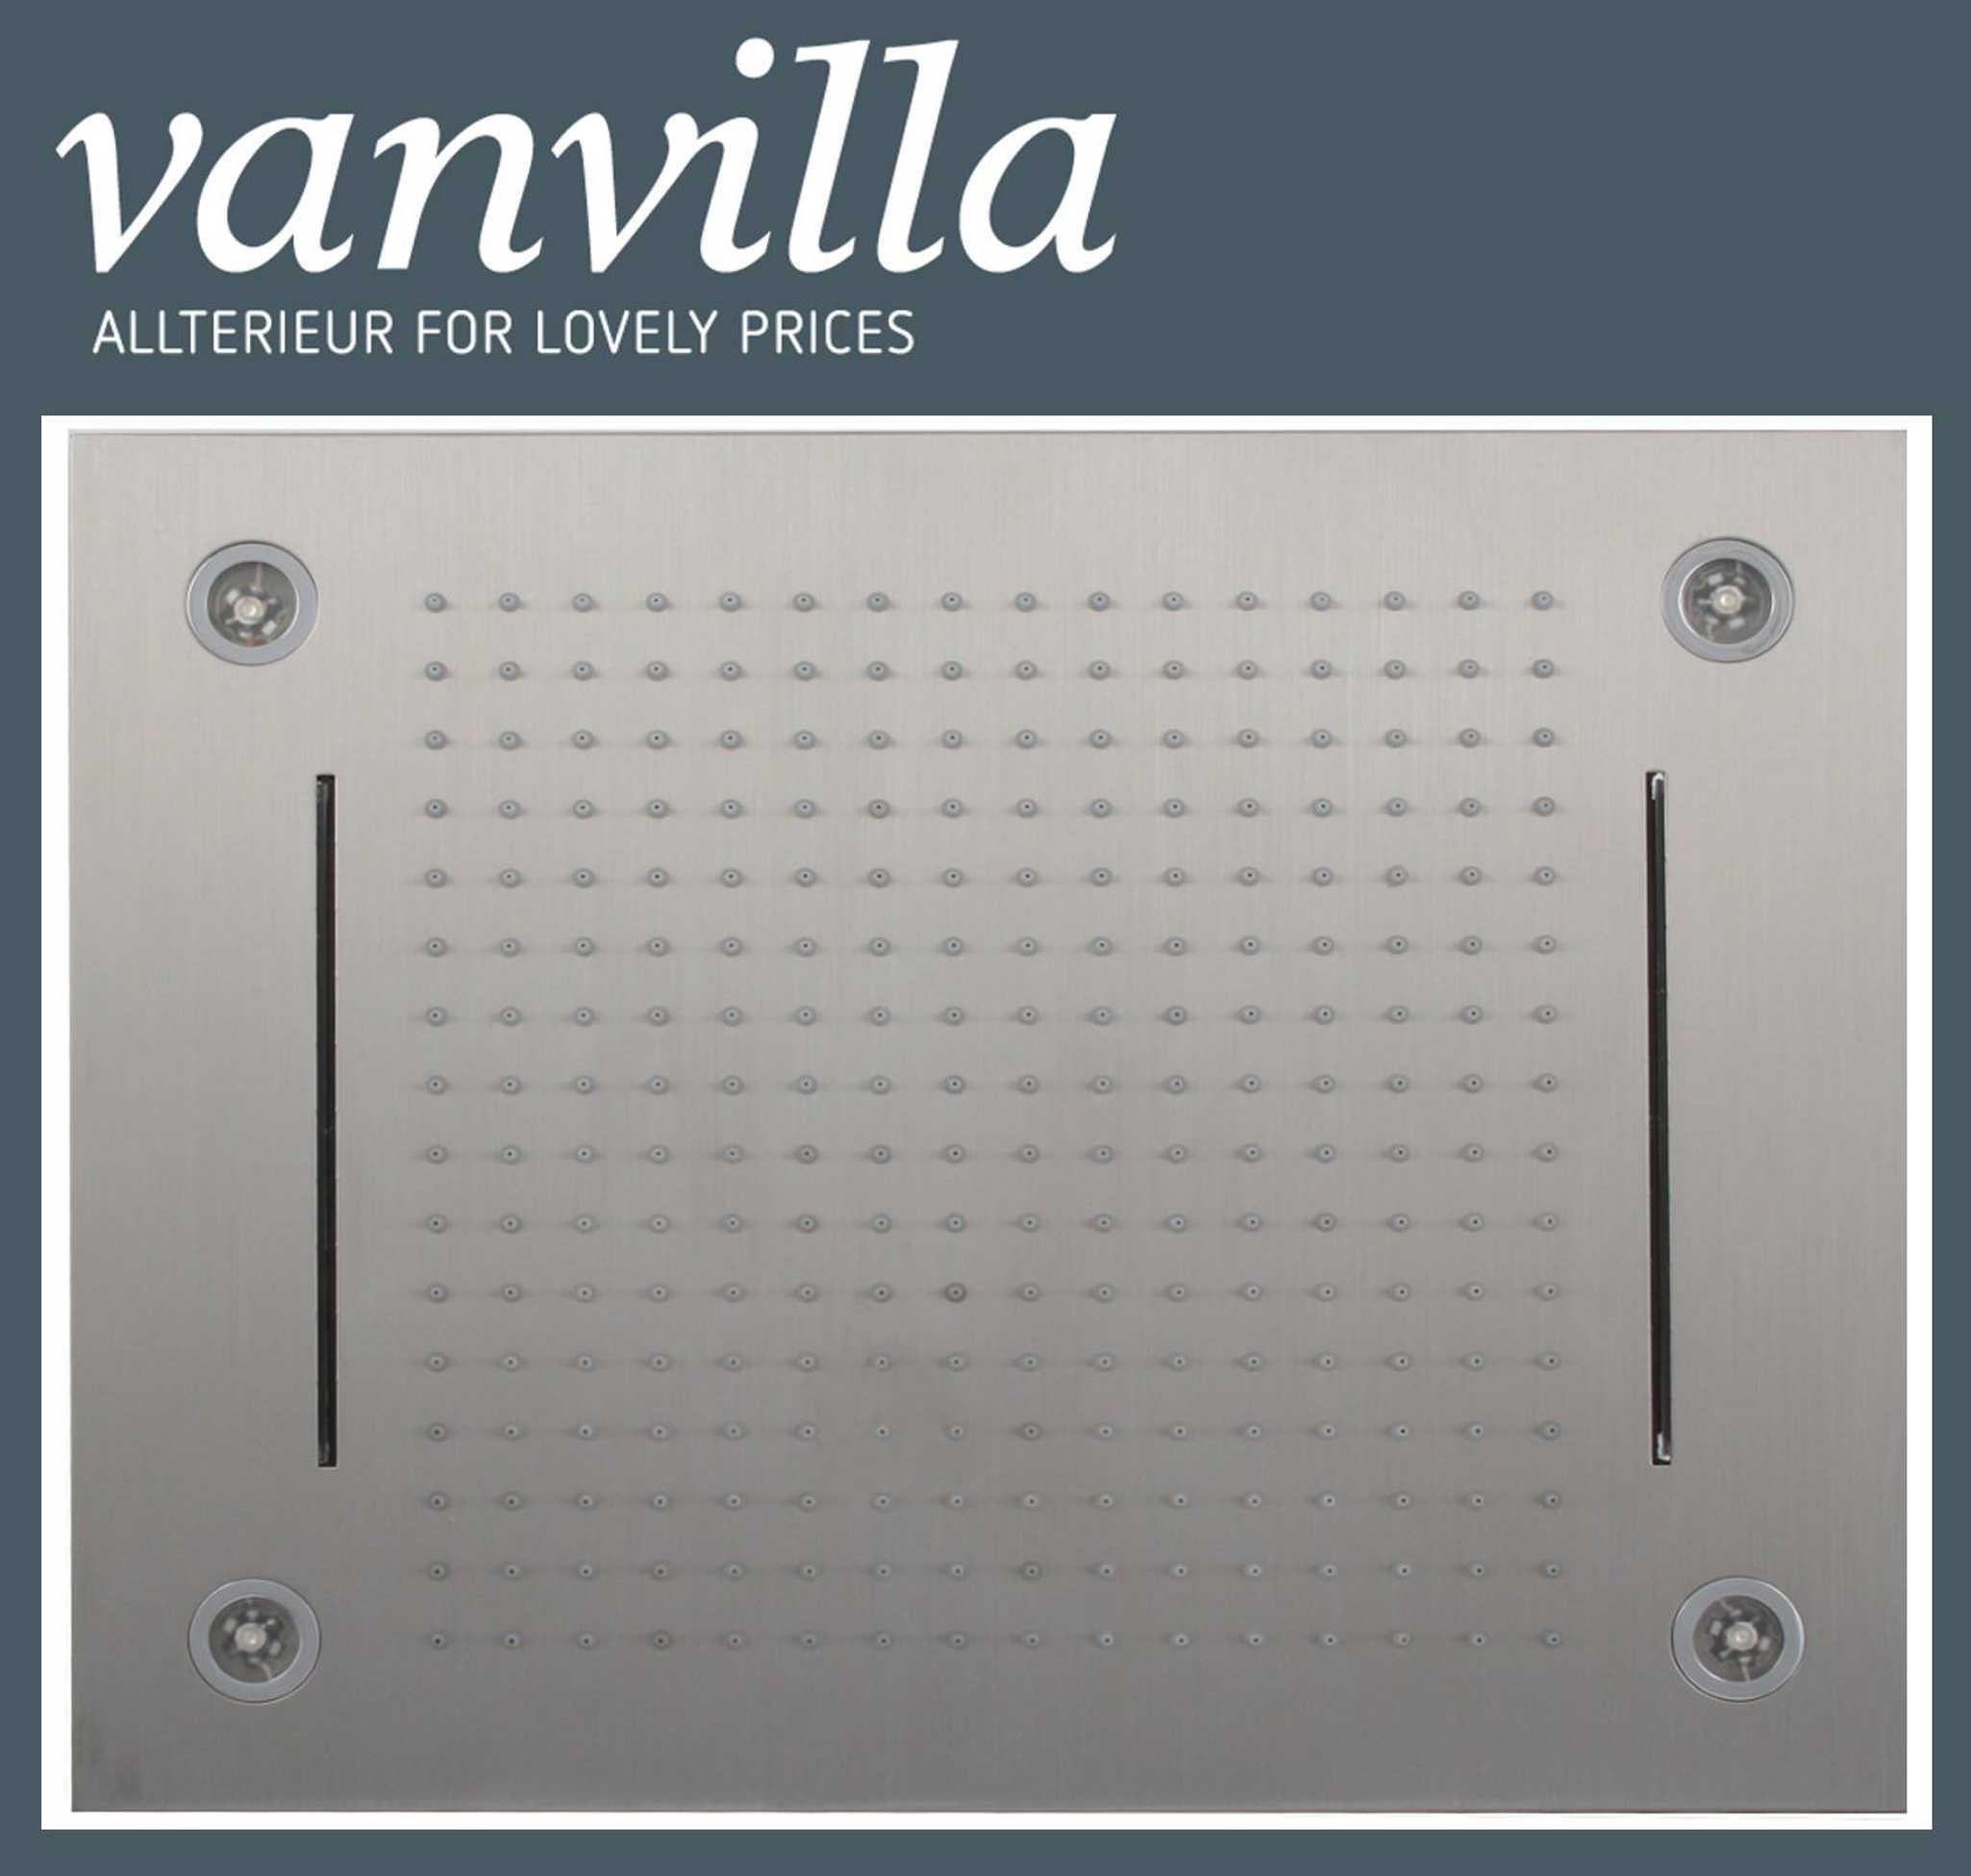 duschkopf vanvilla led 50cm x 40cm edelstahl geb rstet. Black Bedroom Furniture Sets. Home Design Ideas